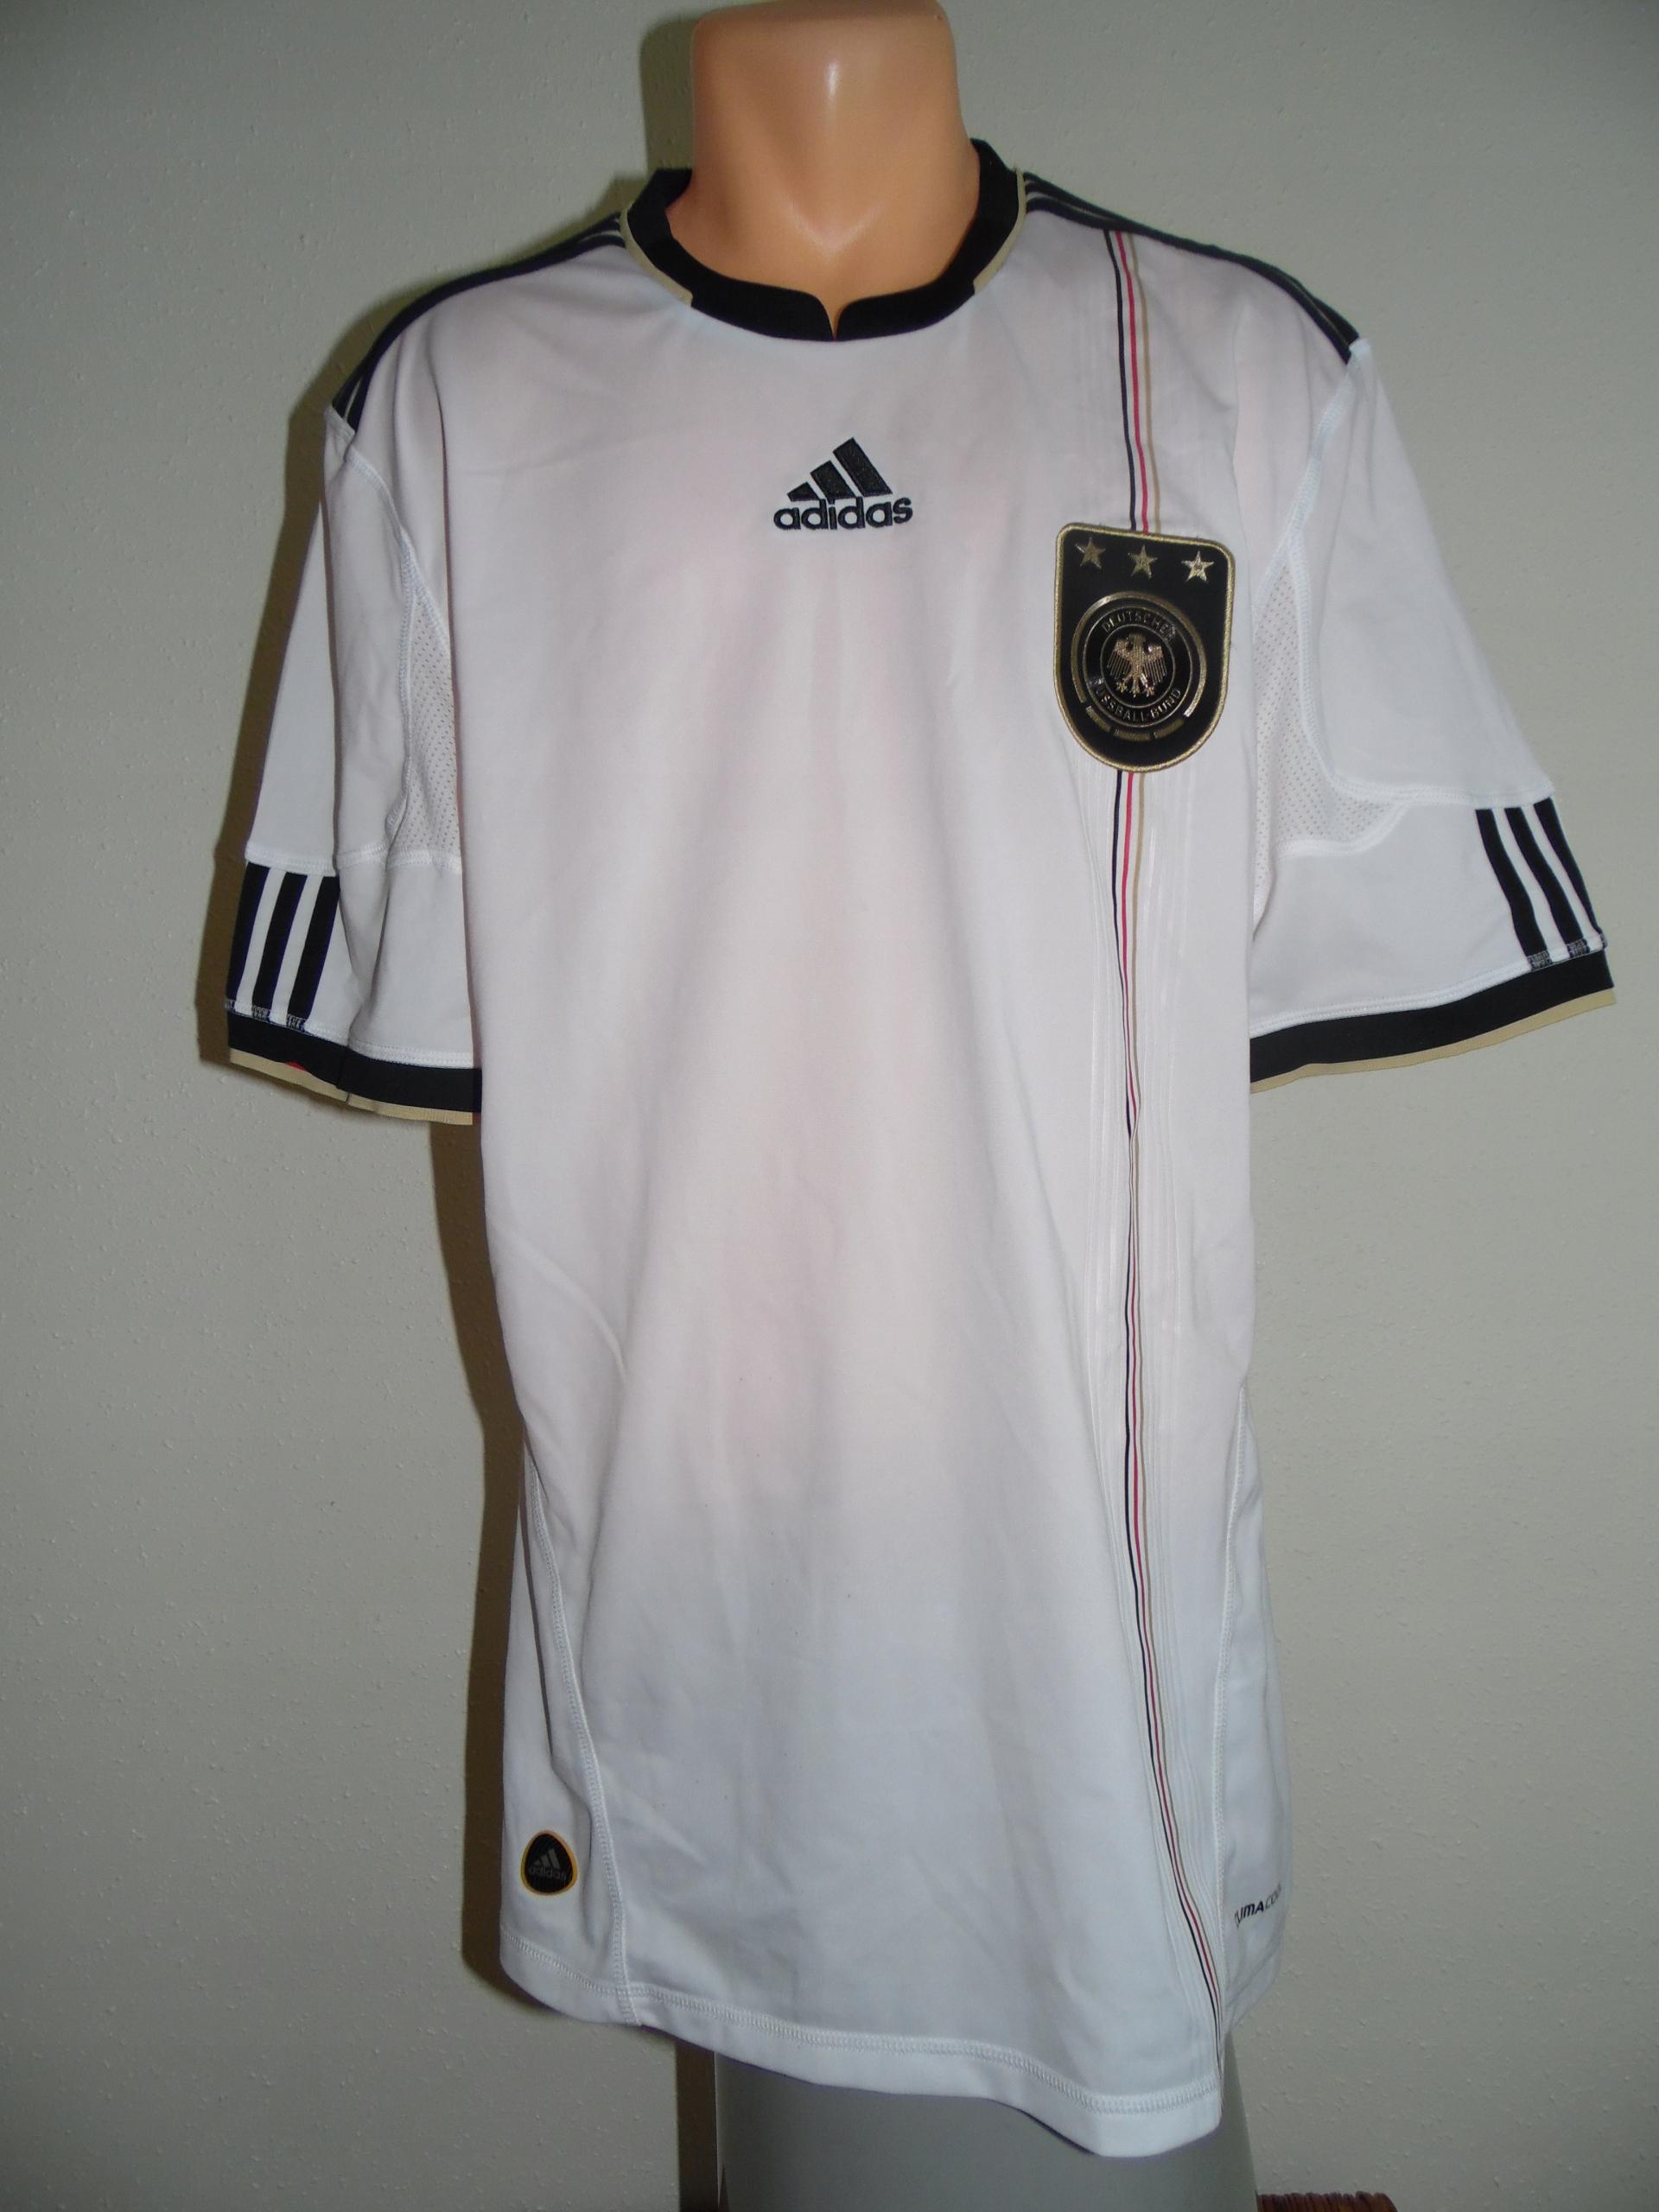 c6d1ea5abcbf Koszulka reprezentacji Niemiec Adidas climacool - 7453484058 ...